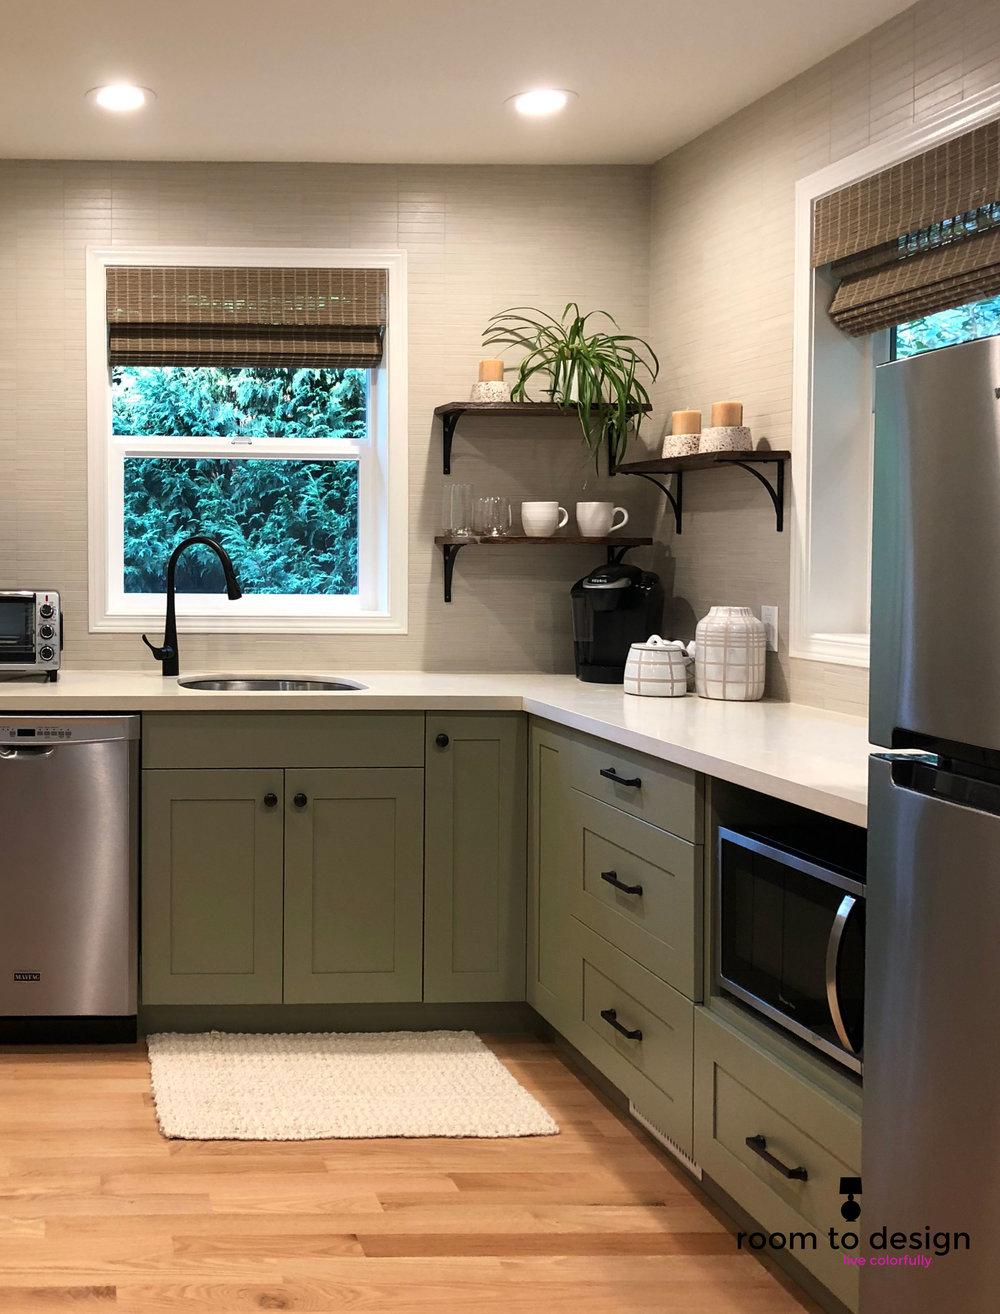 Woodinville_airbnb_kitchenette.jpg